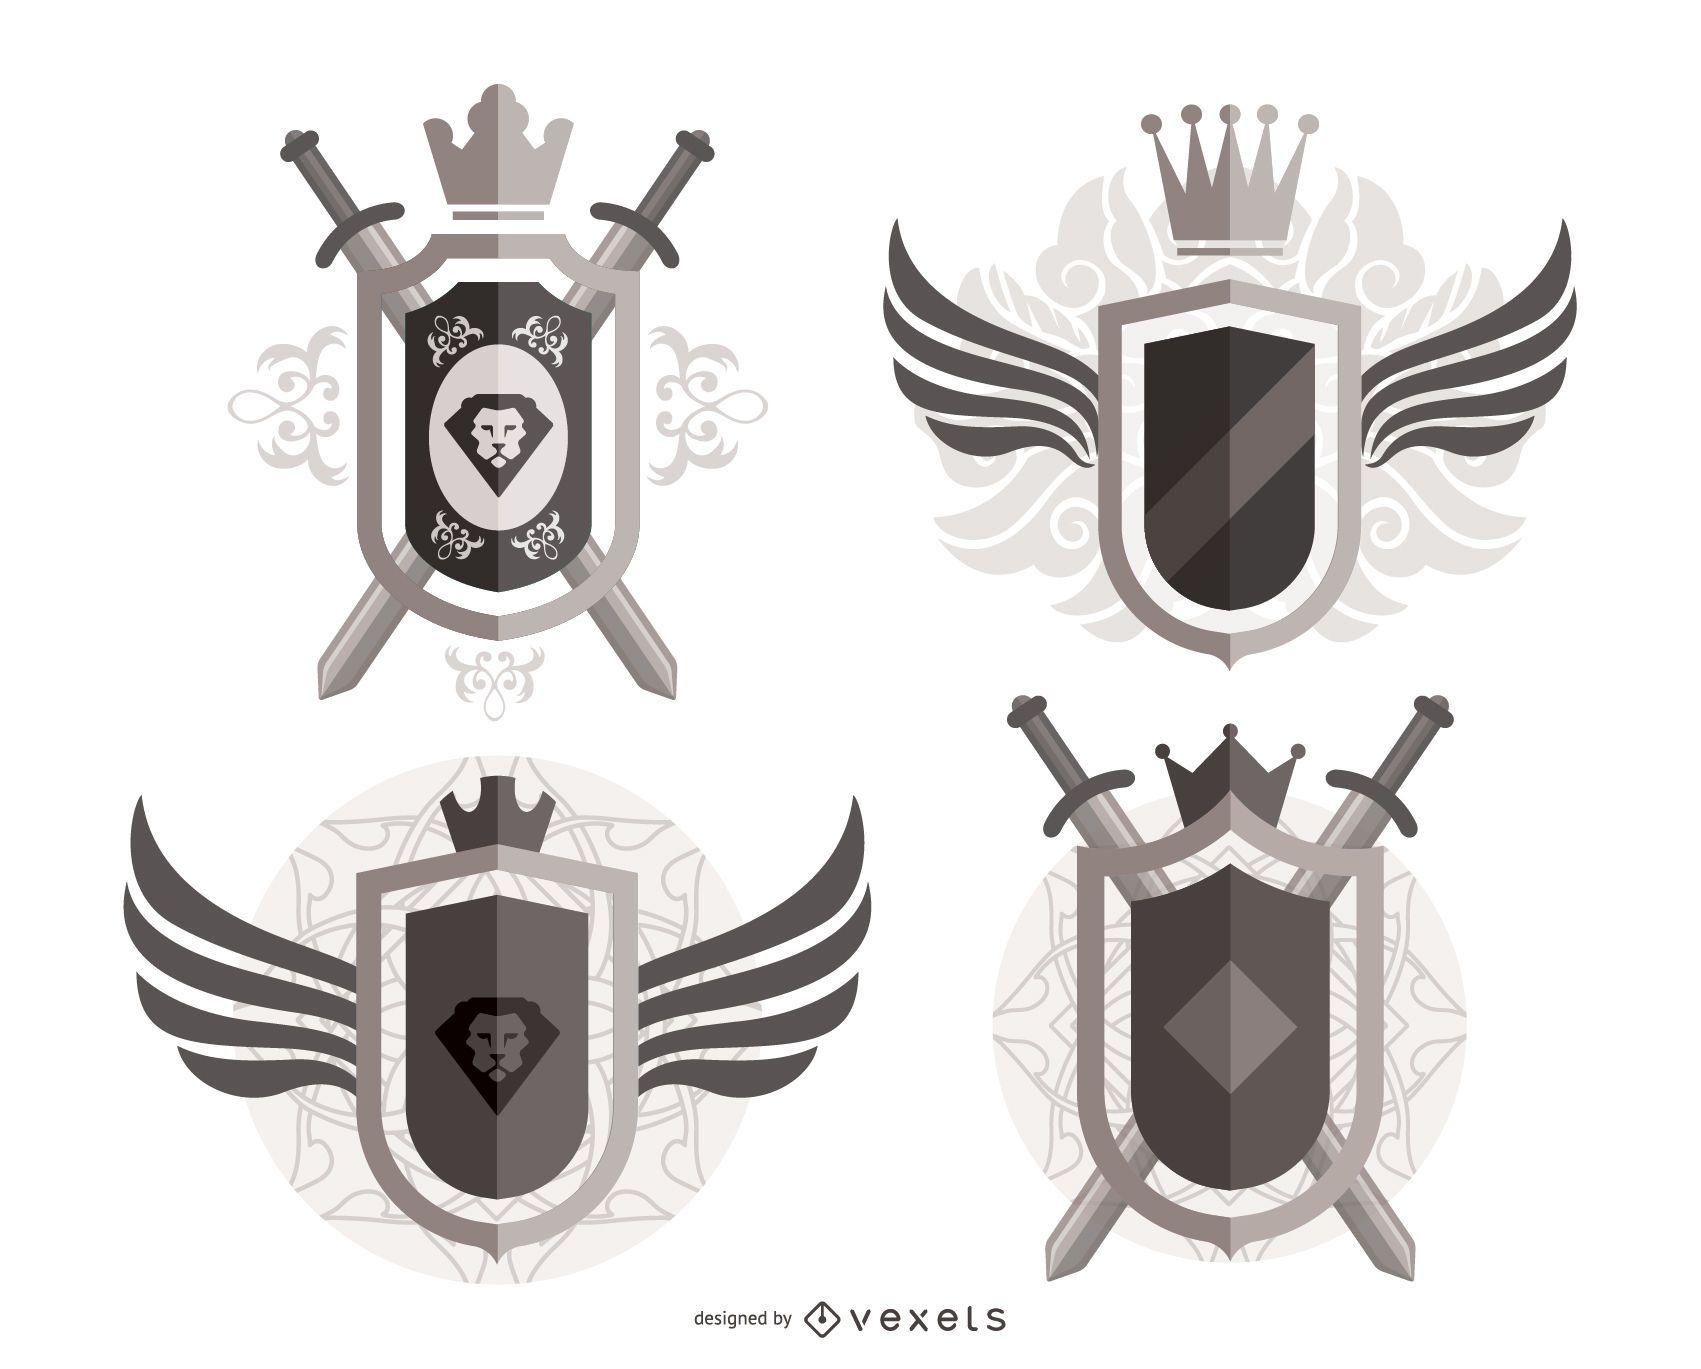 Escudos heráldicos ornamentados